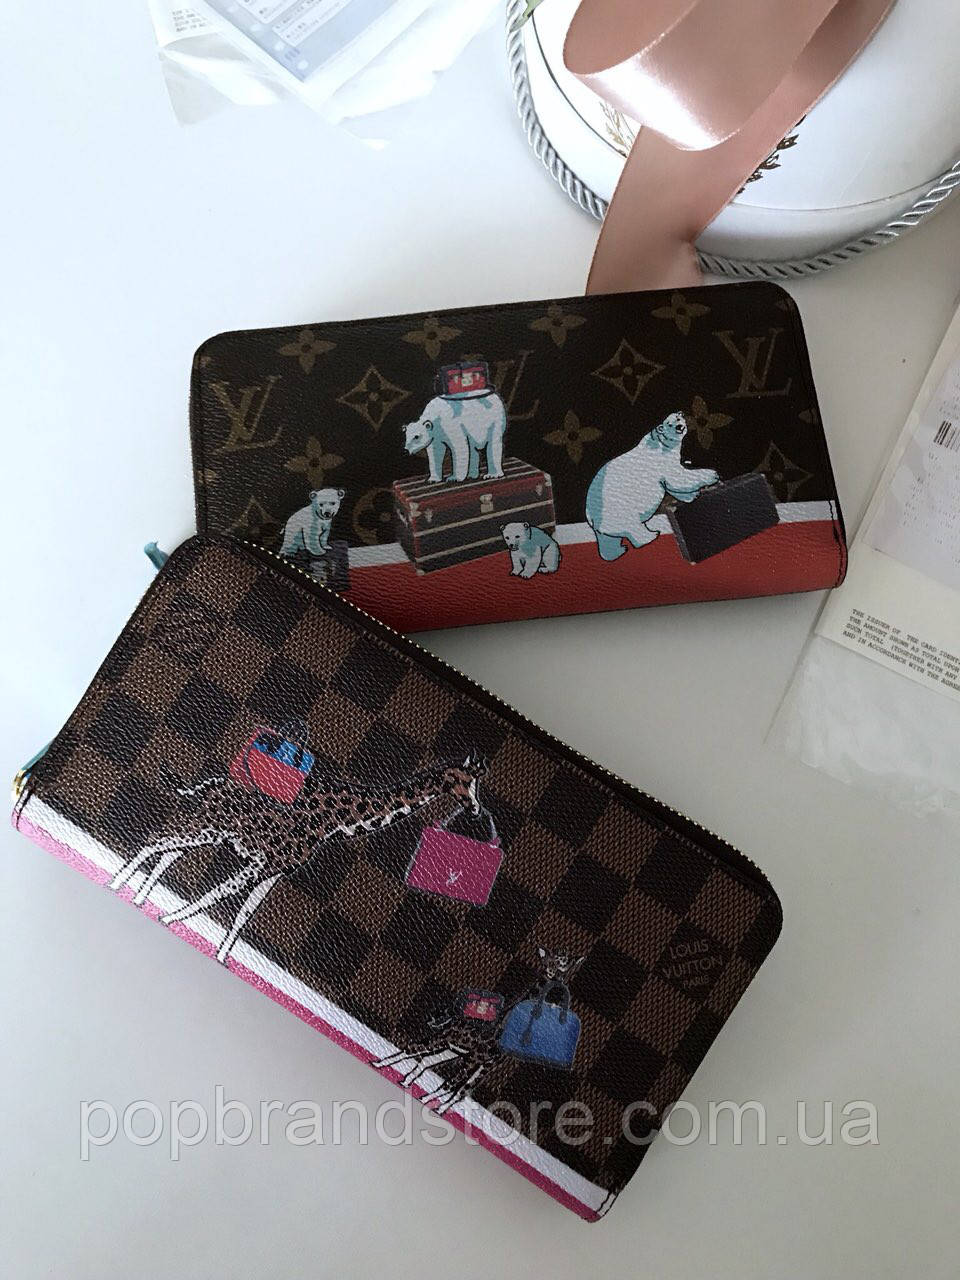 d1a346b1da6b Портмоне LOUIS VUITTON DAMIER CANVAS жираф (реплика) - Pop Brand Store |  брендовые сумки